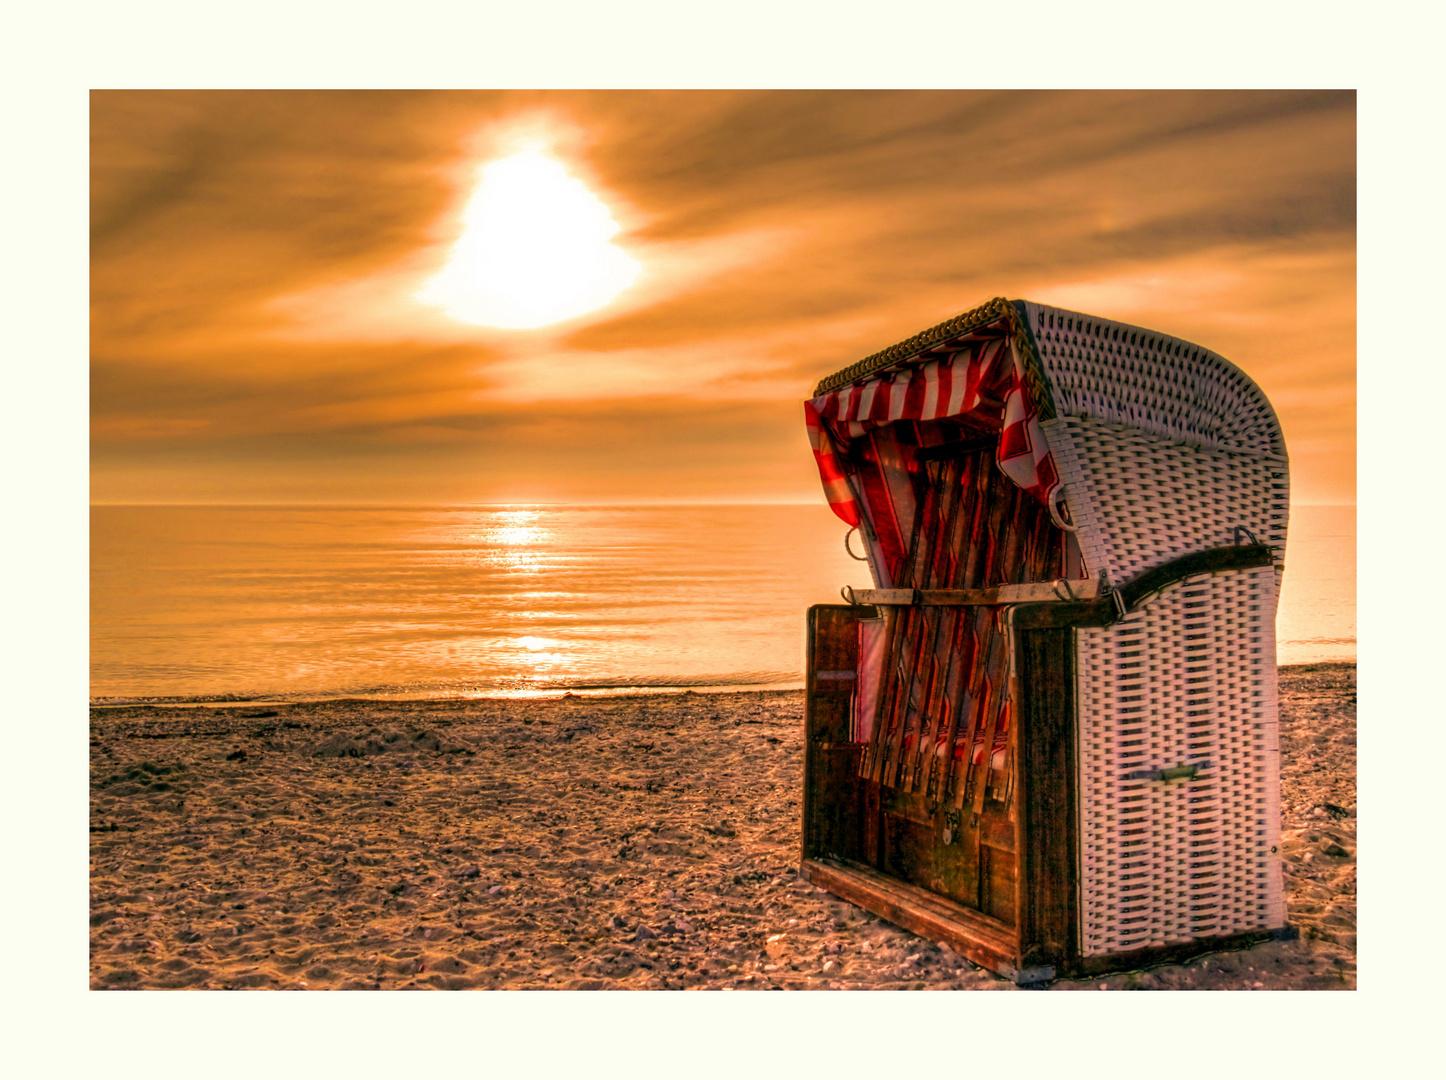 Strandkorb sonnenuntergang  Fehmarn Sonnenuntergang mit Strandkorb Foto & Bild | deutschland ...